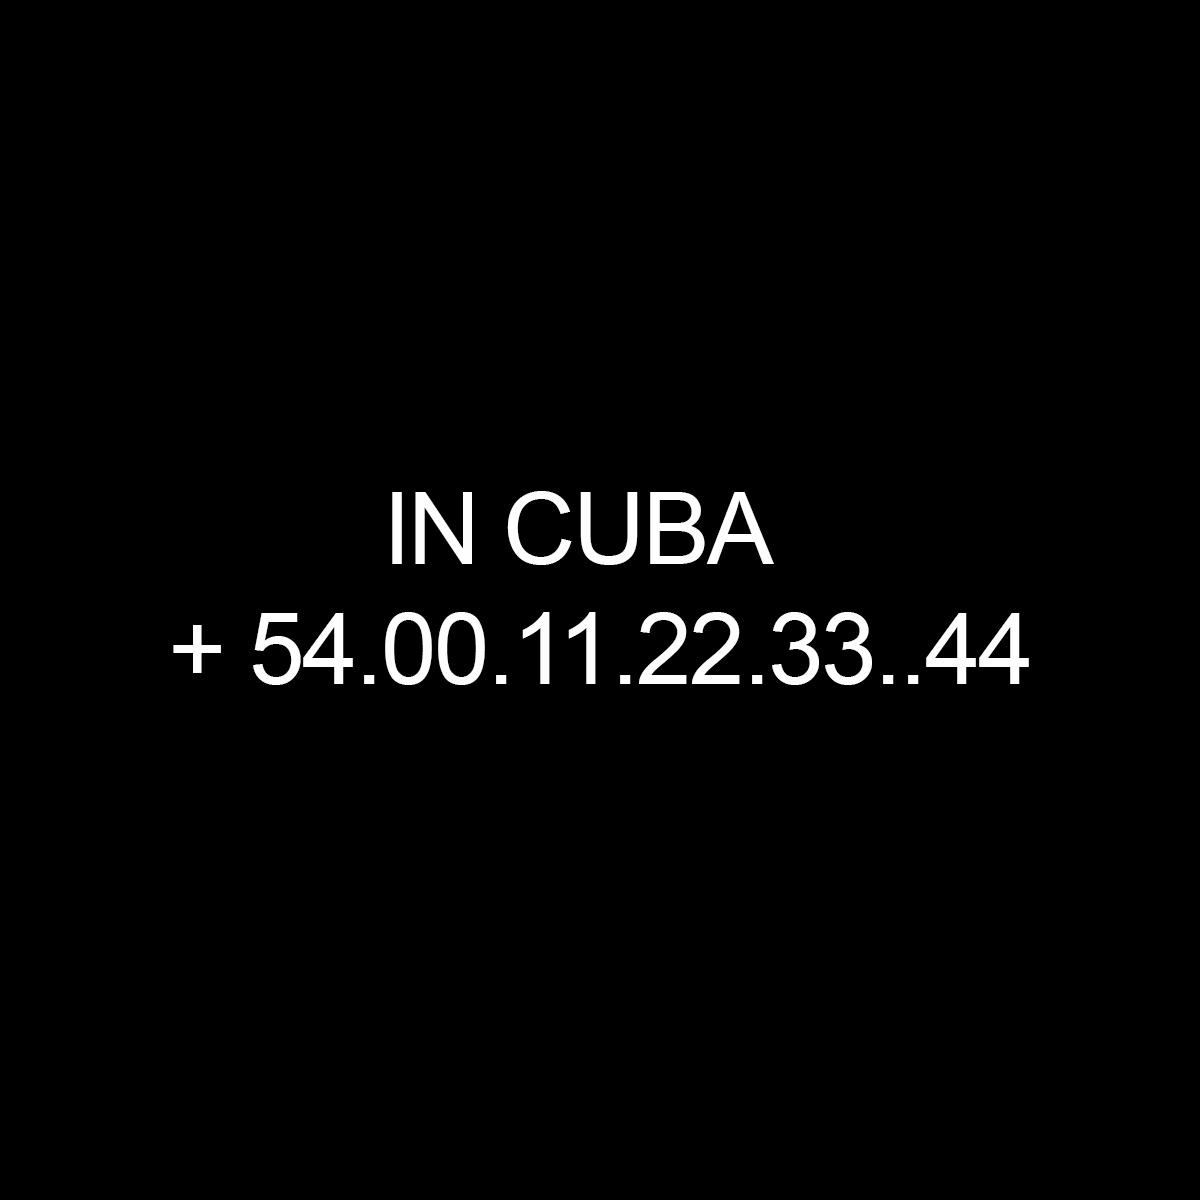 Local number in Cuba